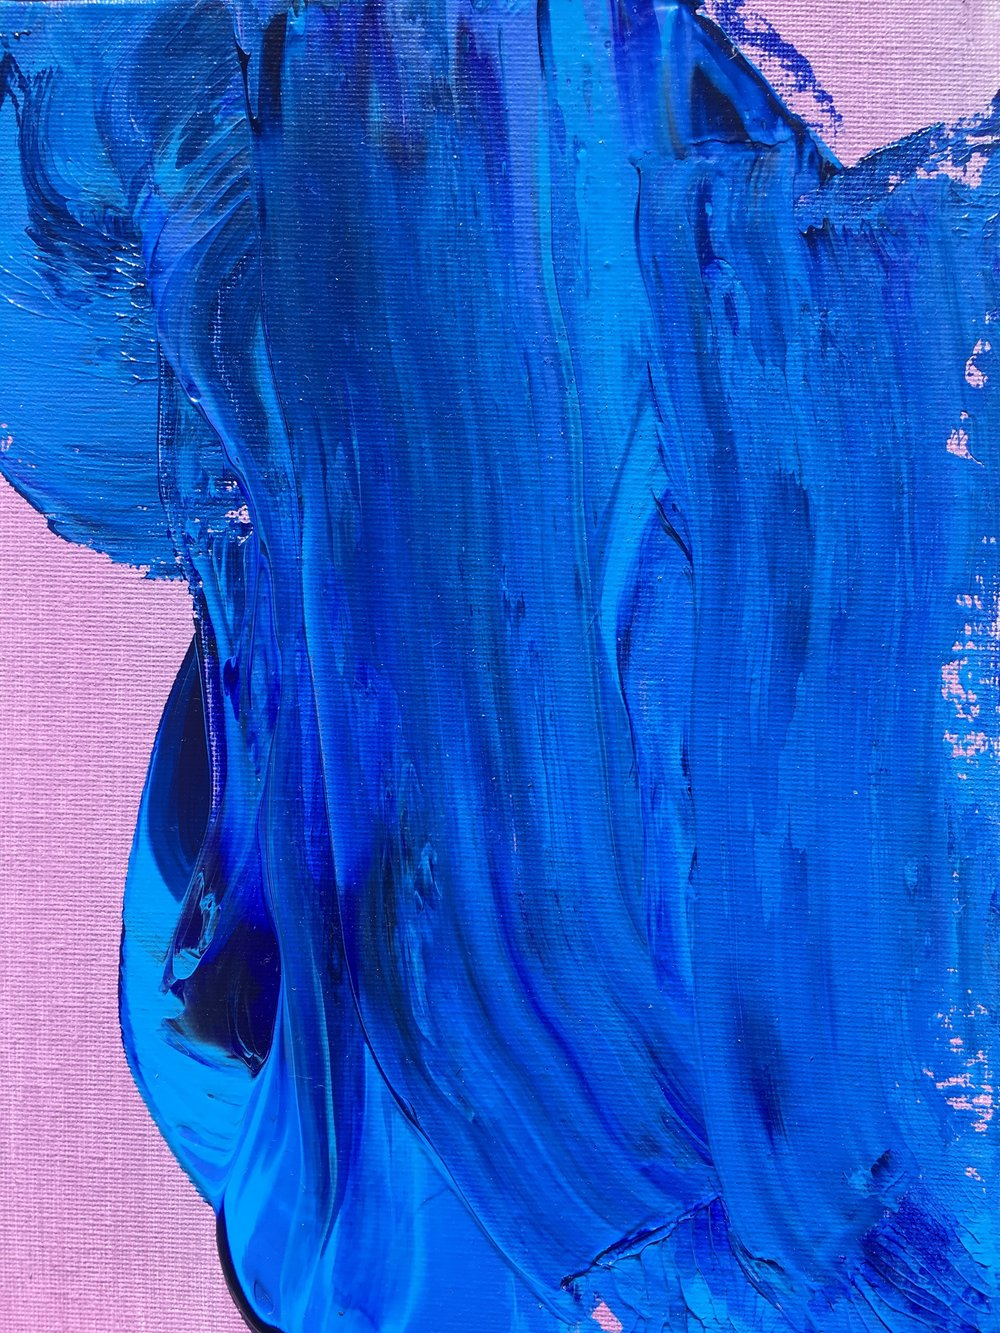 "purple haze, acrylic paint, 8x10"" panels, (2018)"